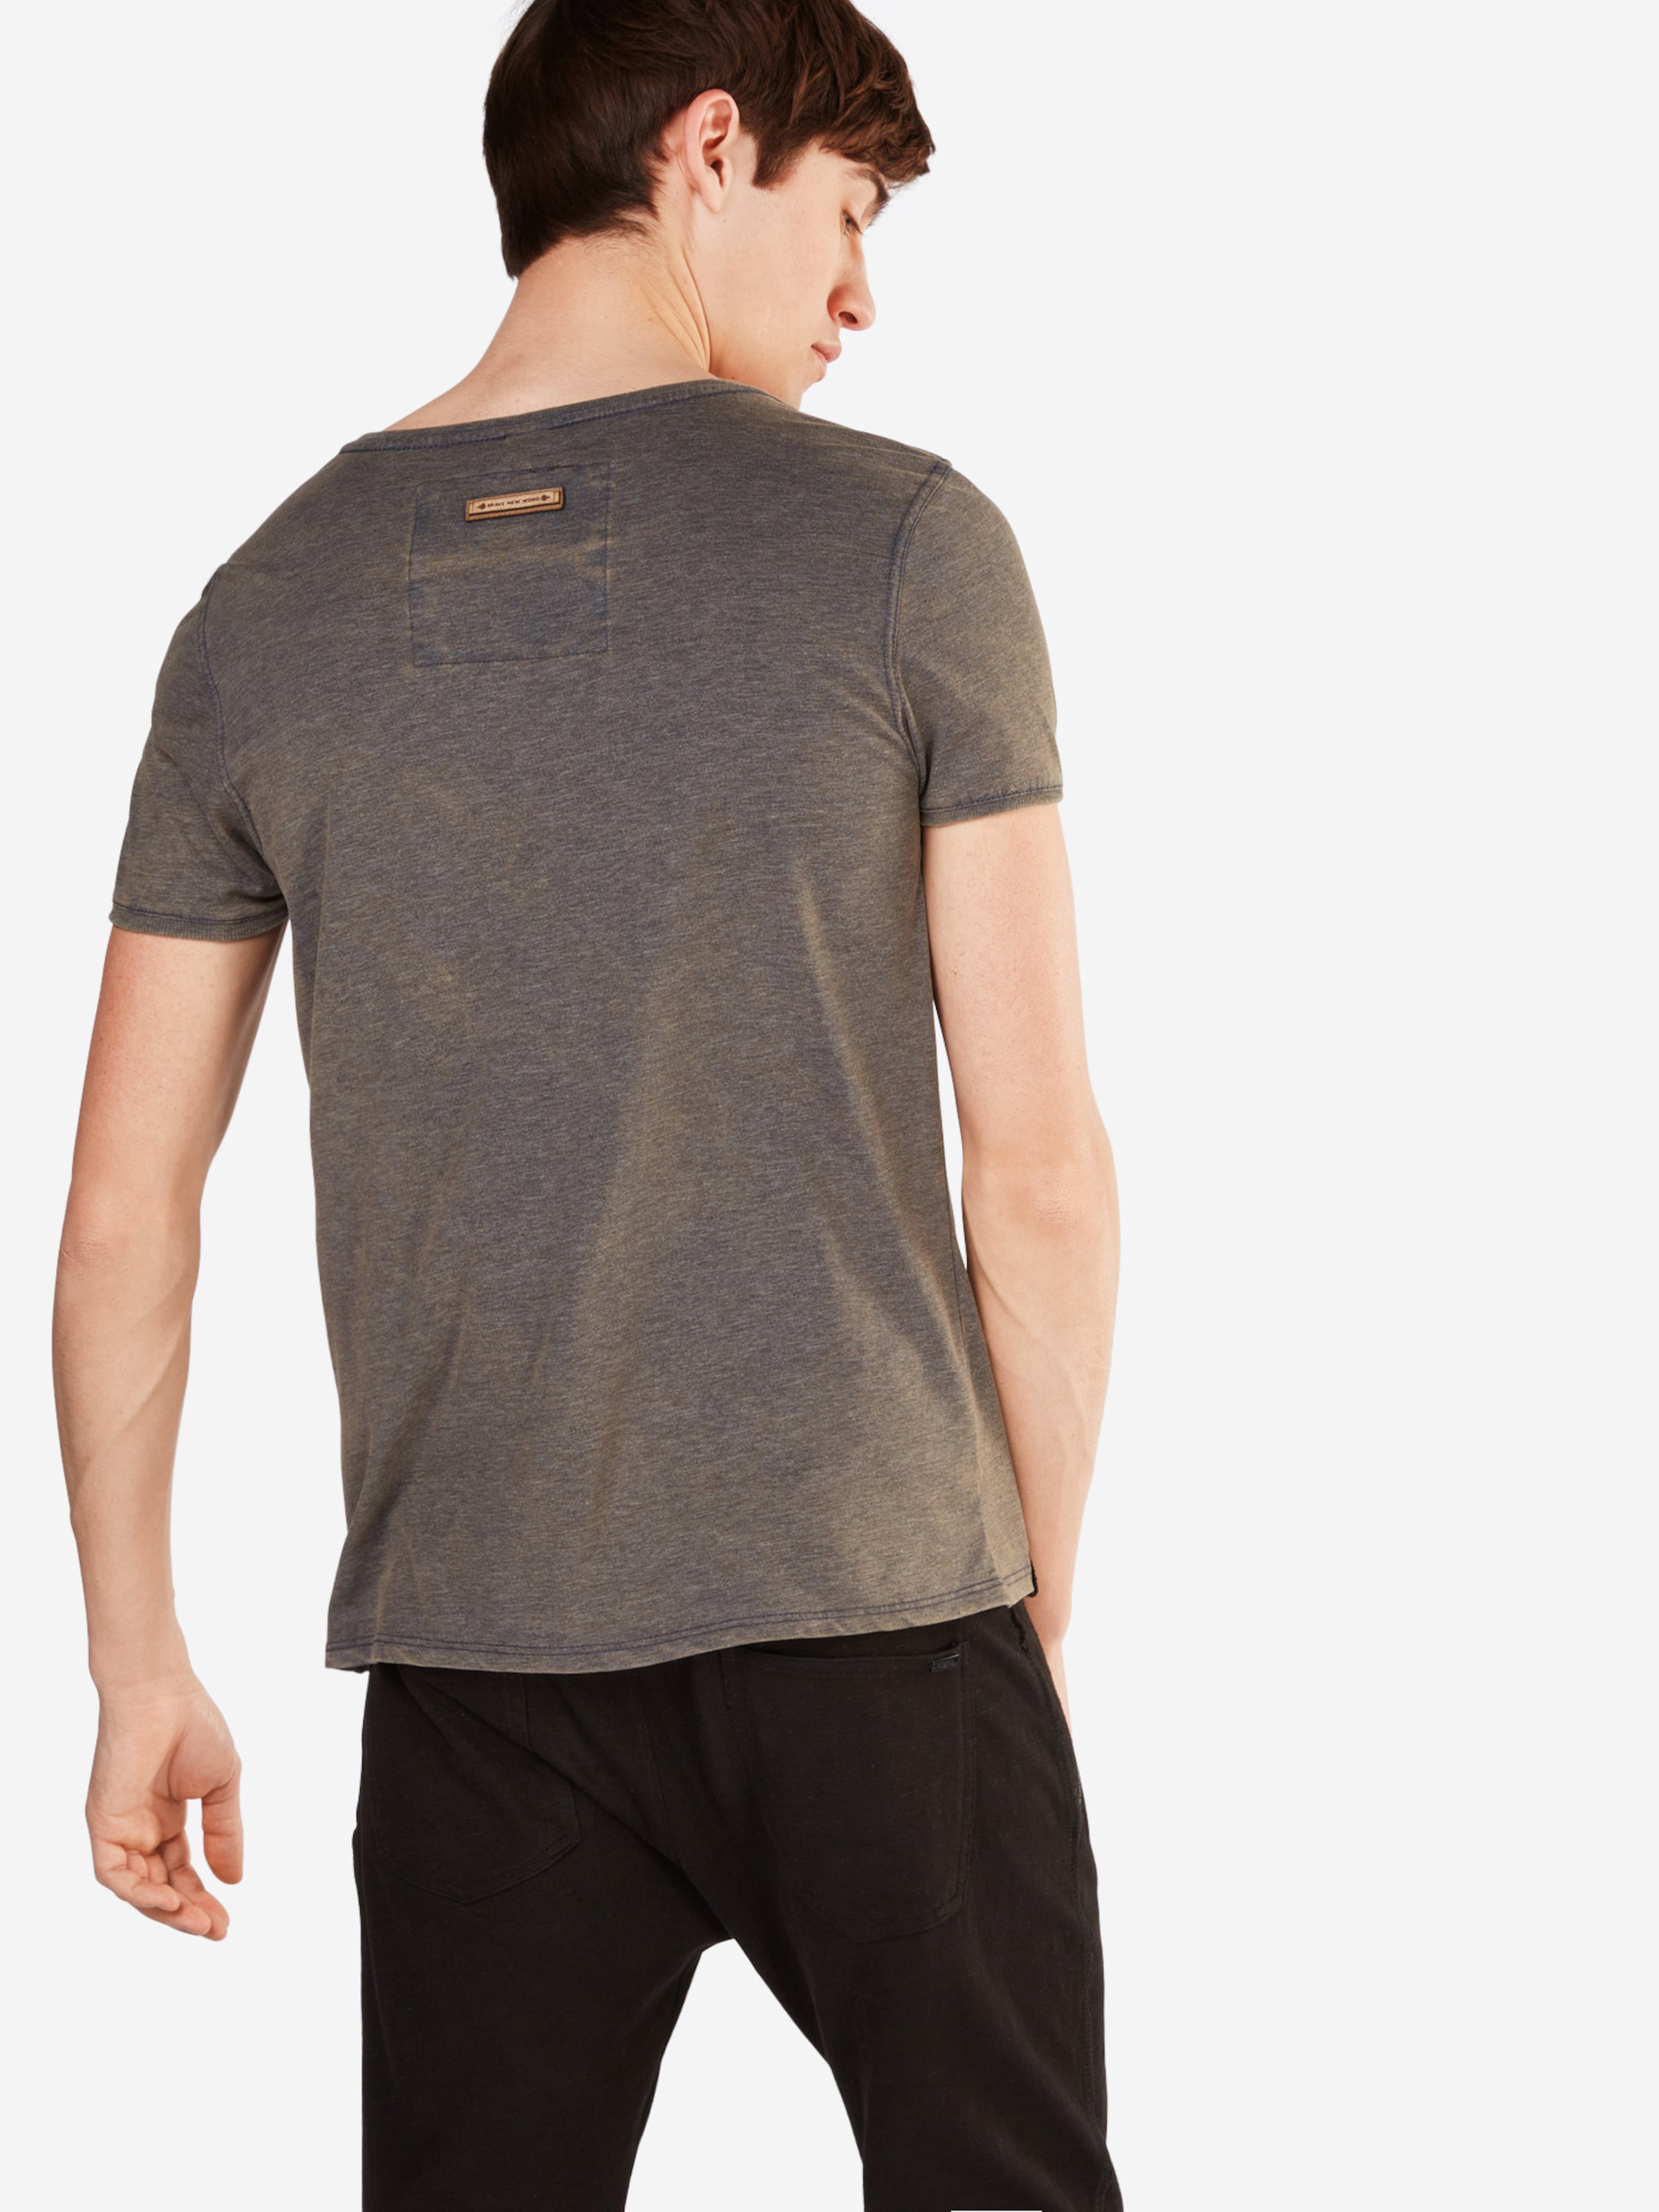 Naketano GreigeViolet Clair 'schimpanski' En T shirt DIYE2eWH9b